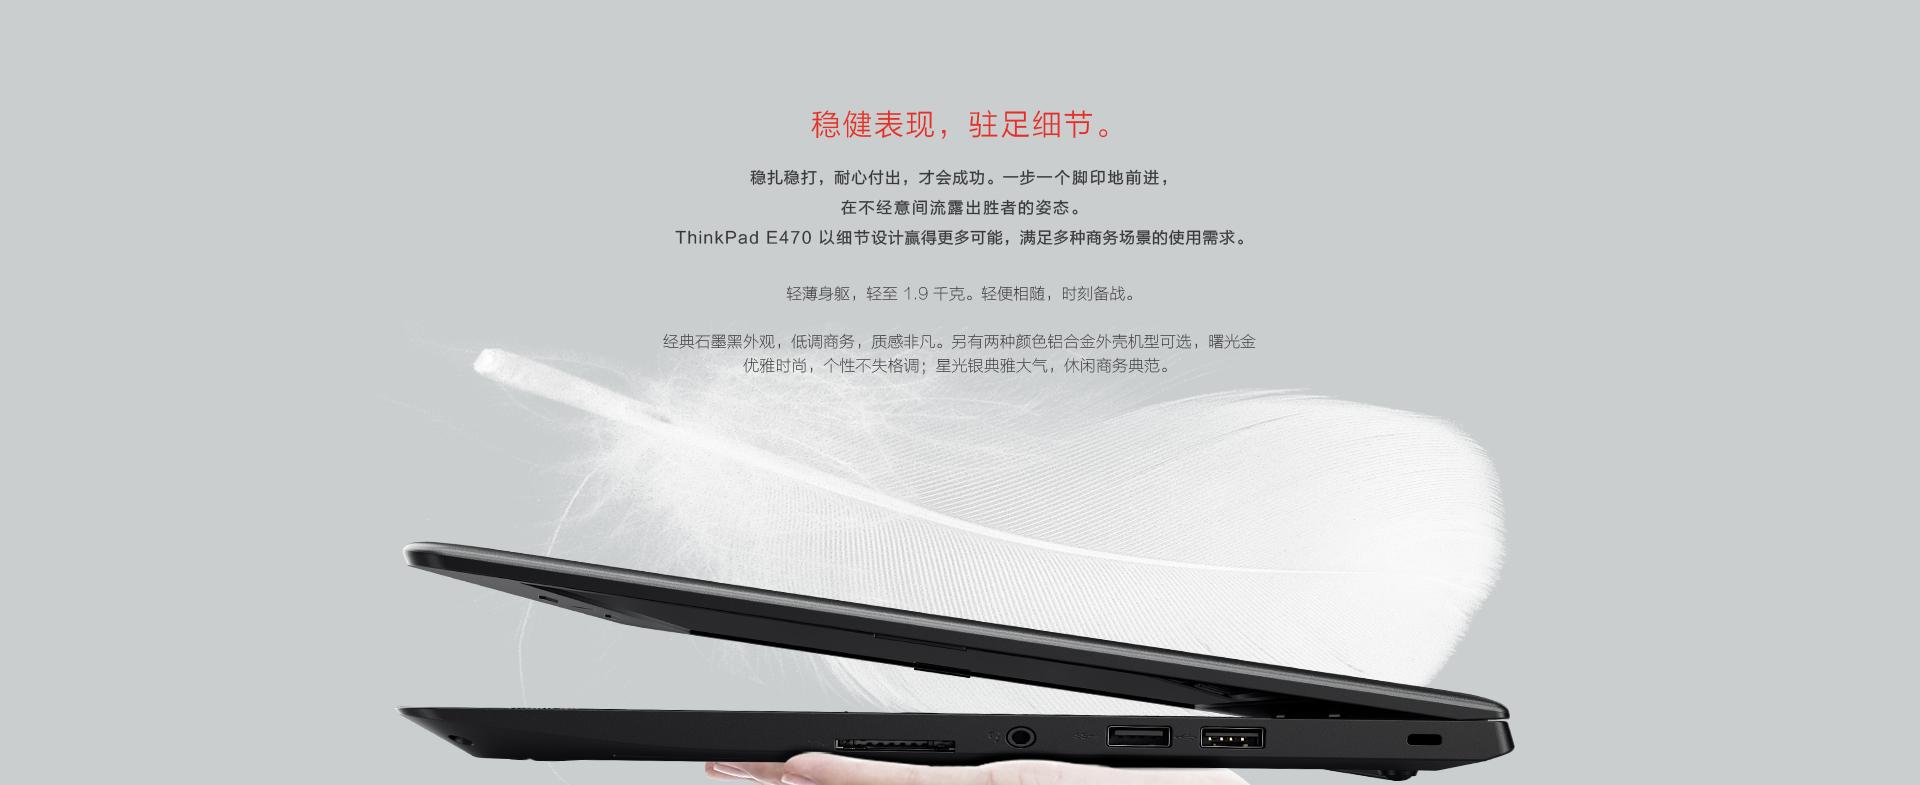 ThinkPad E470-44-2.jpg